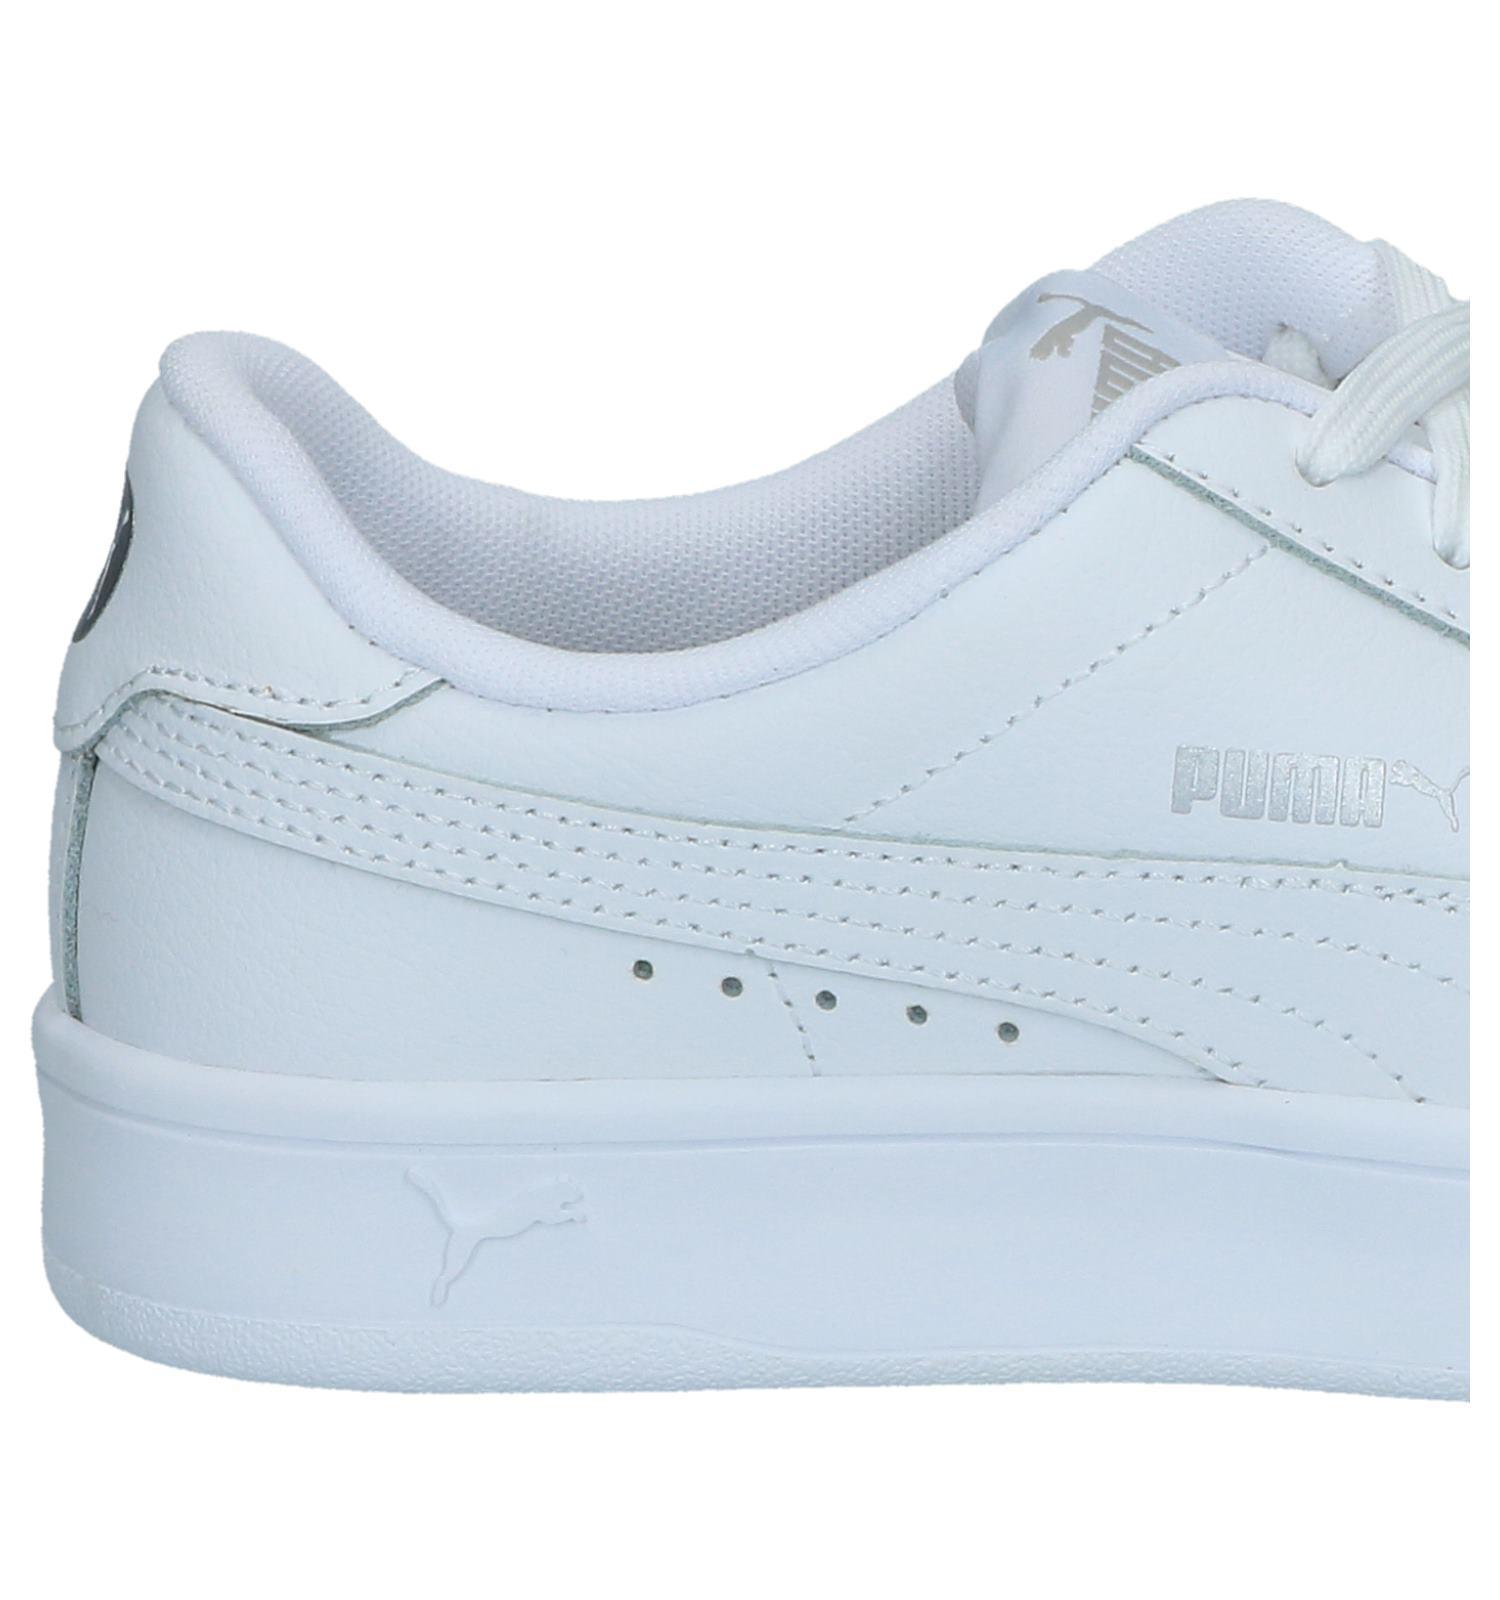 Breaker nl DerbySchoenentorfs Gratis Sneakers Puma Court Witte eWdxBorQC